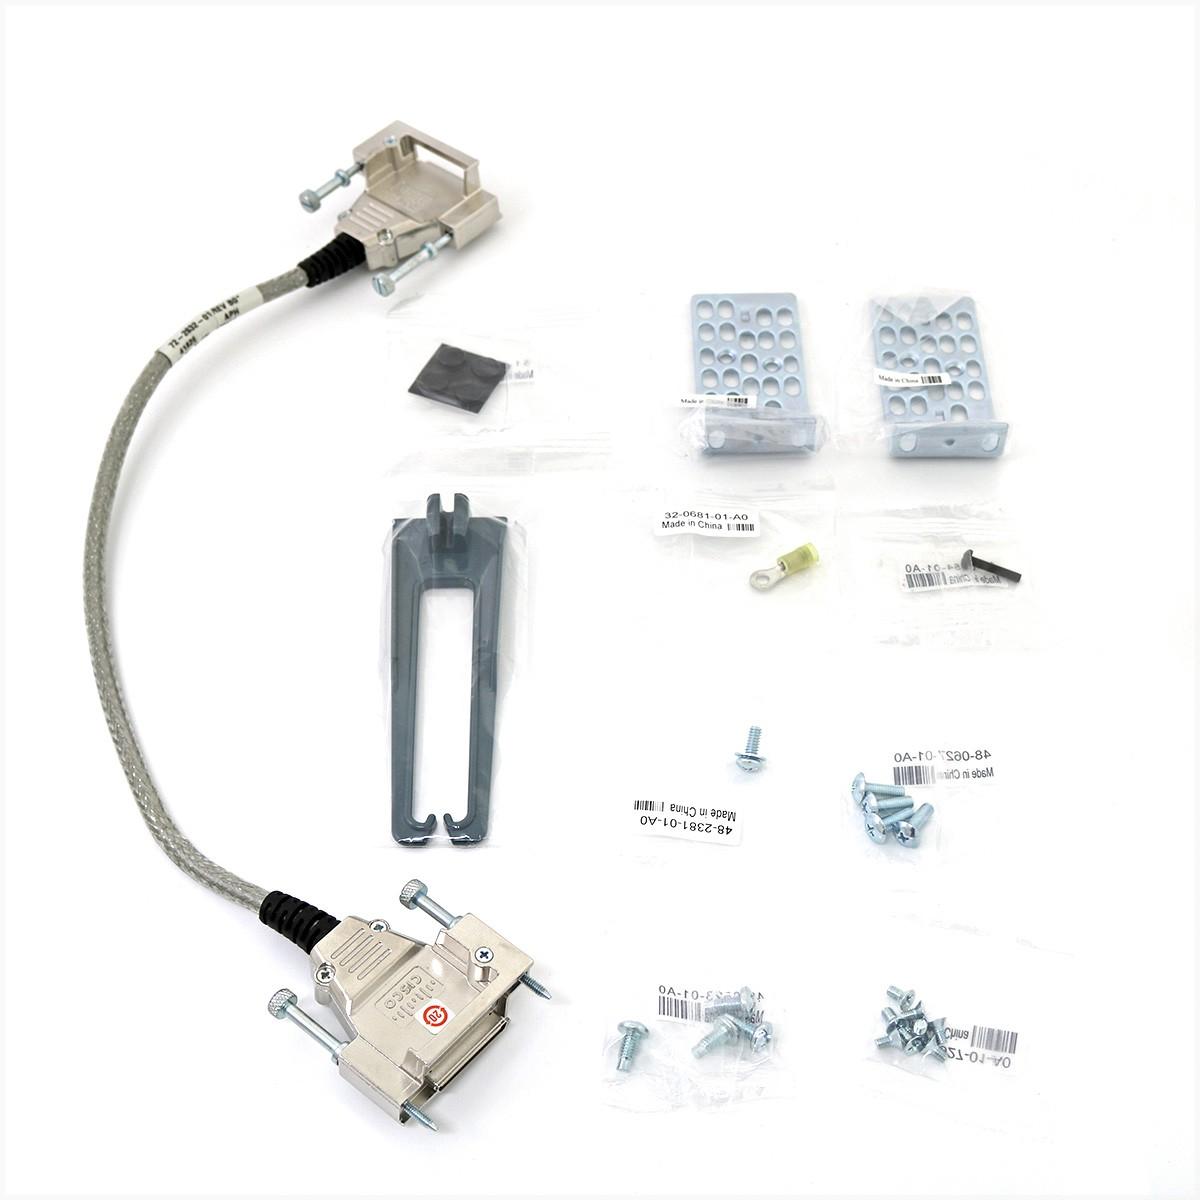 Switch cisco ws-c3750x-48pf-l 04 gigabit 48 portas - usado